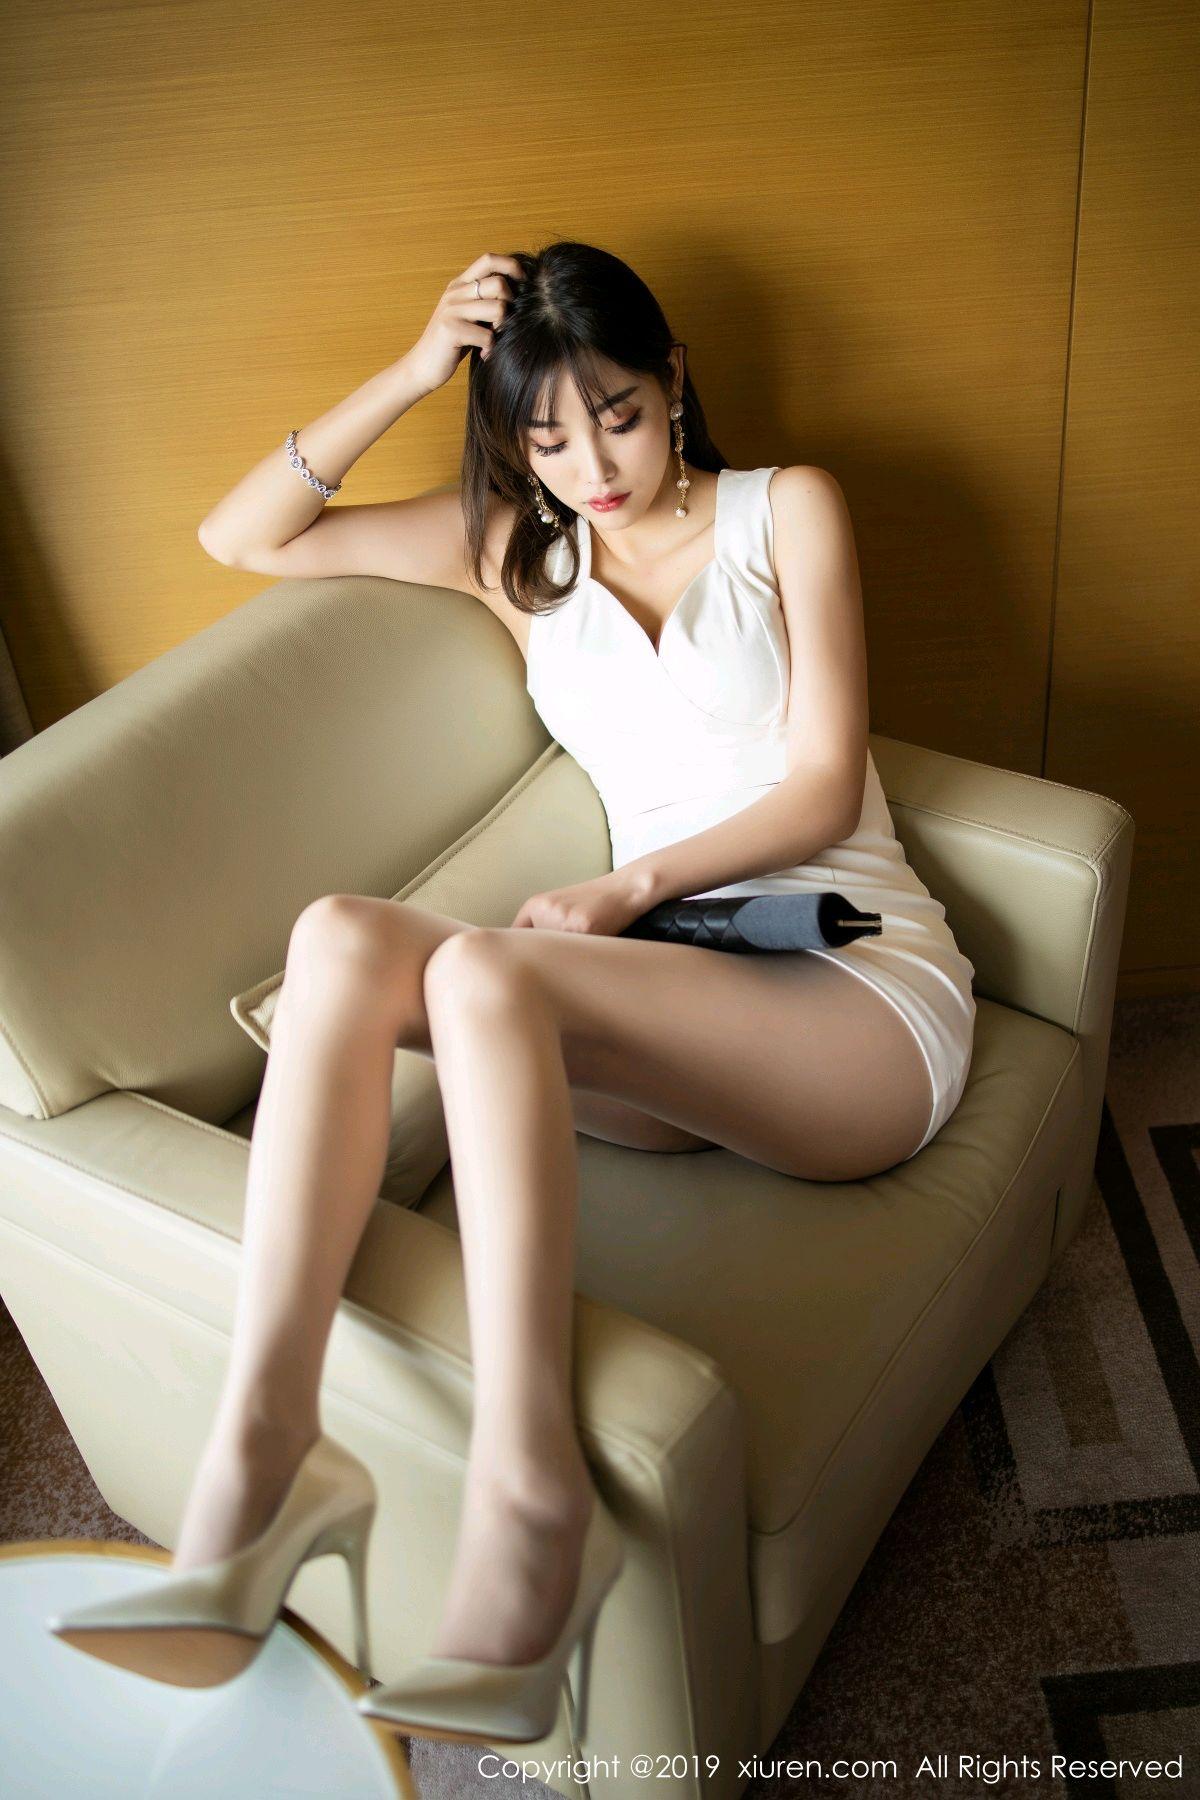 [XiuRen] Vol.1695 Yang Chen Chen 26P, Foot, Tall, Underwear, Xiuren, Yang Chen Chen